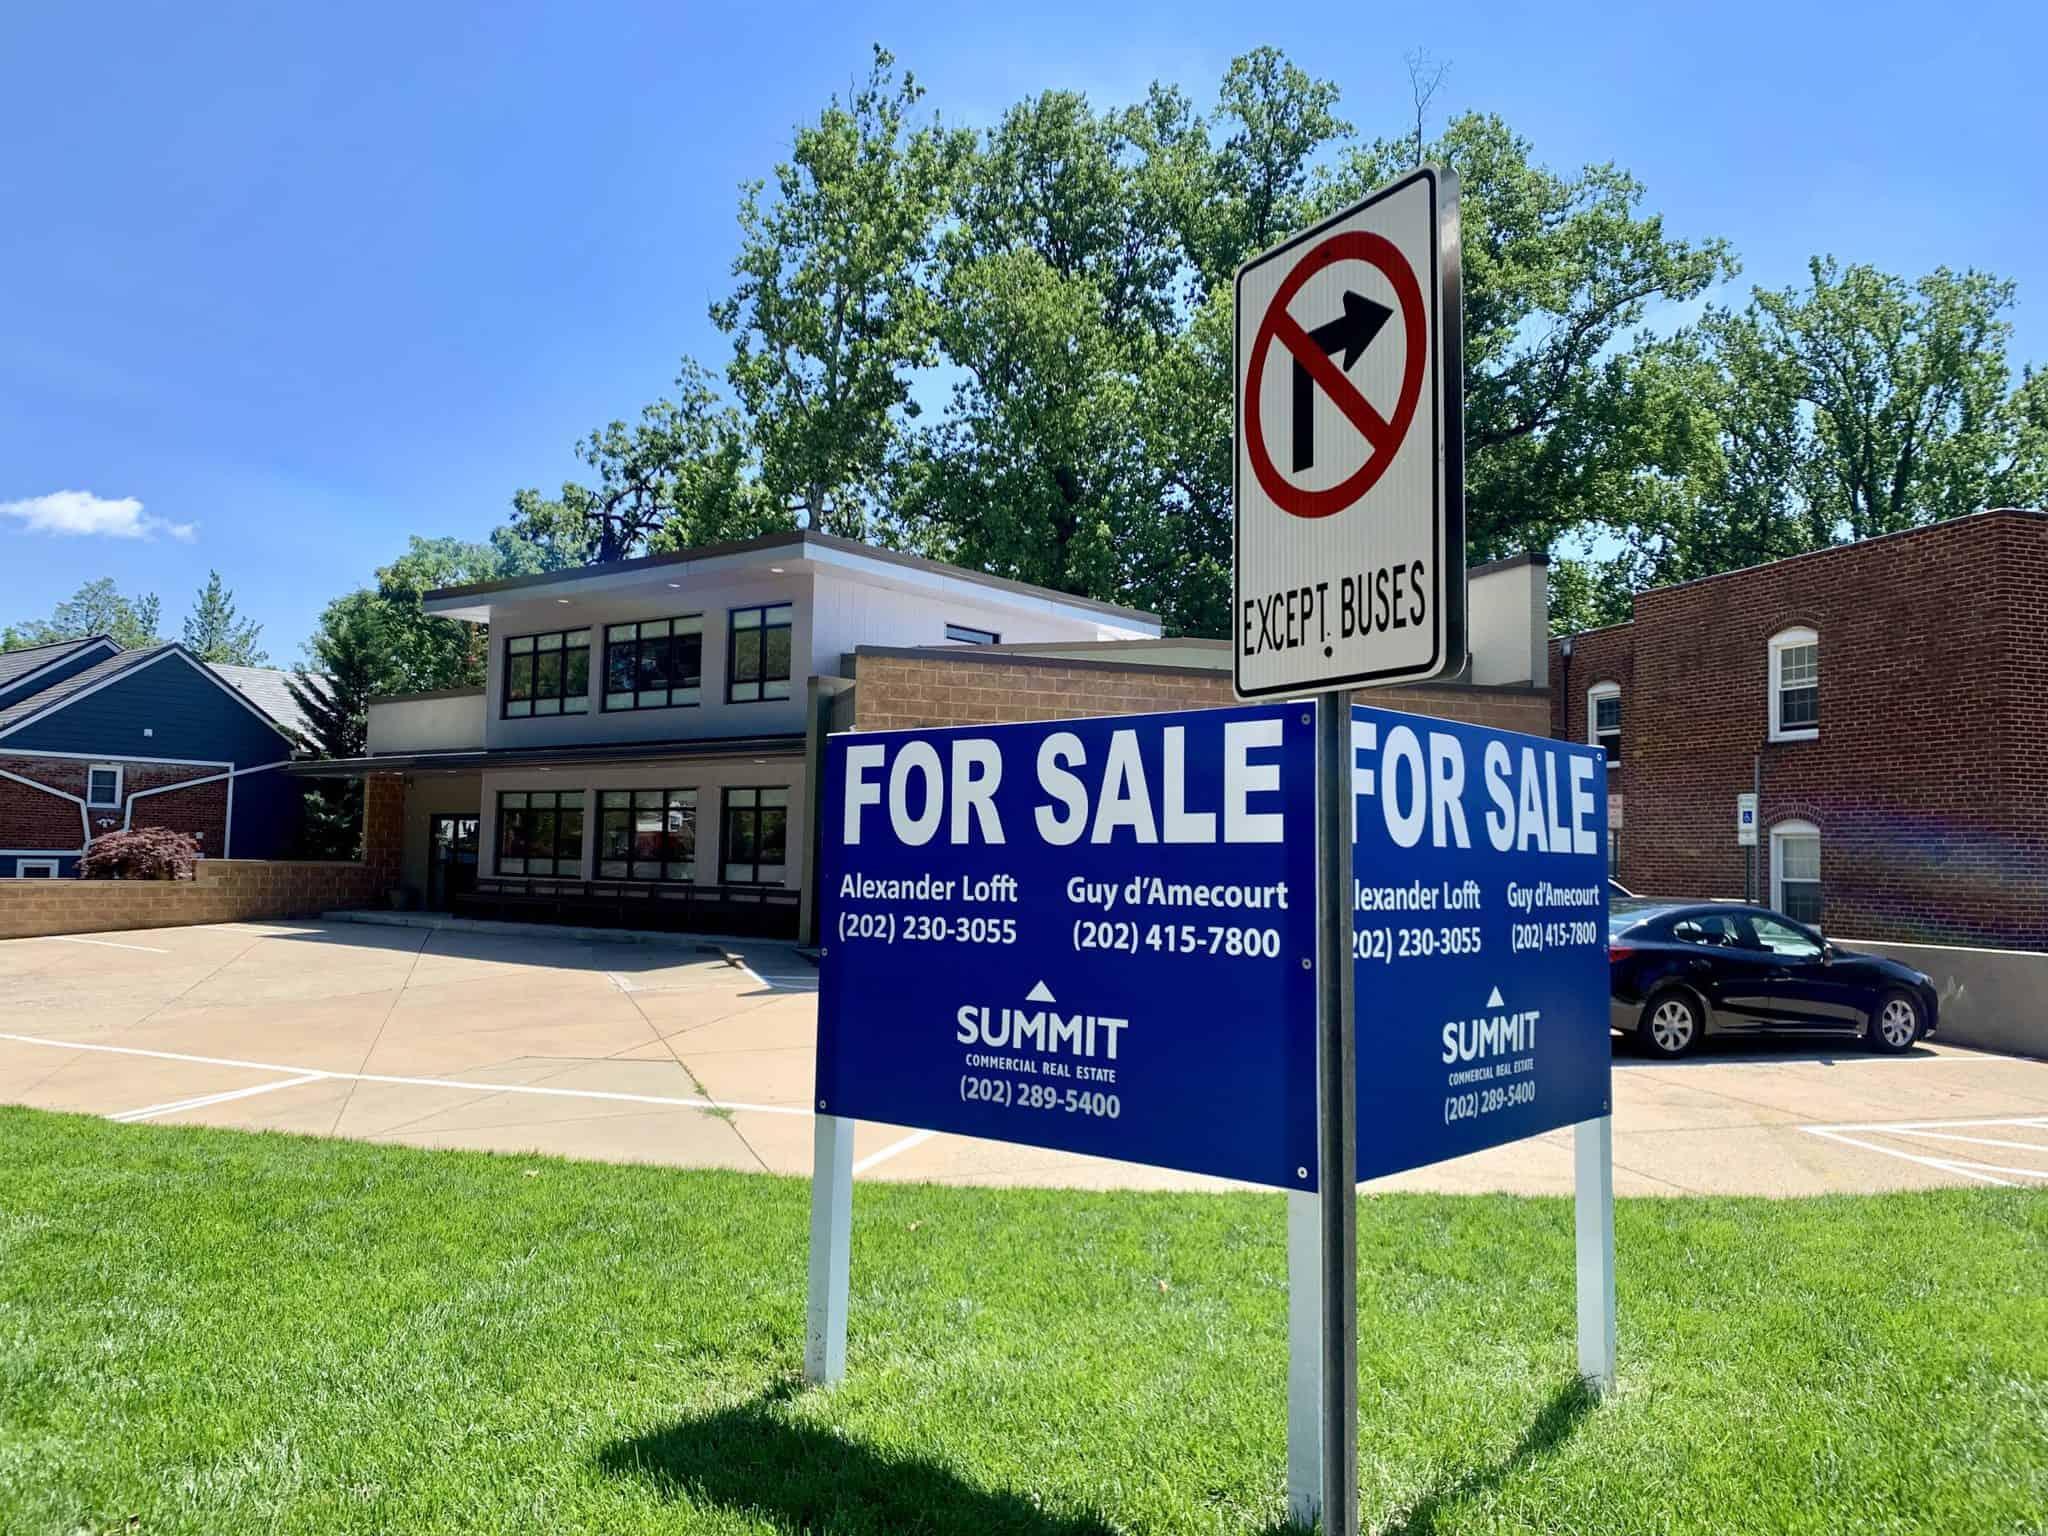 Washington Revels Christmas 2020 Washington Revels Headquarters Listed For Sale, May Force a Move